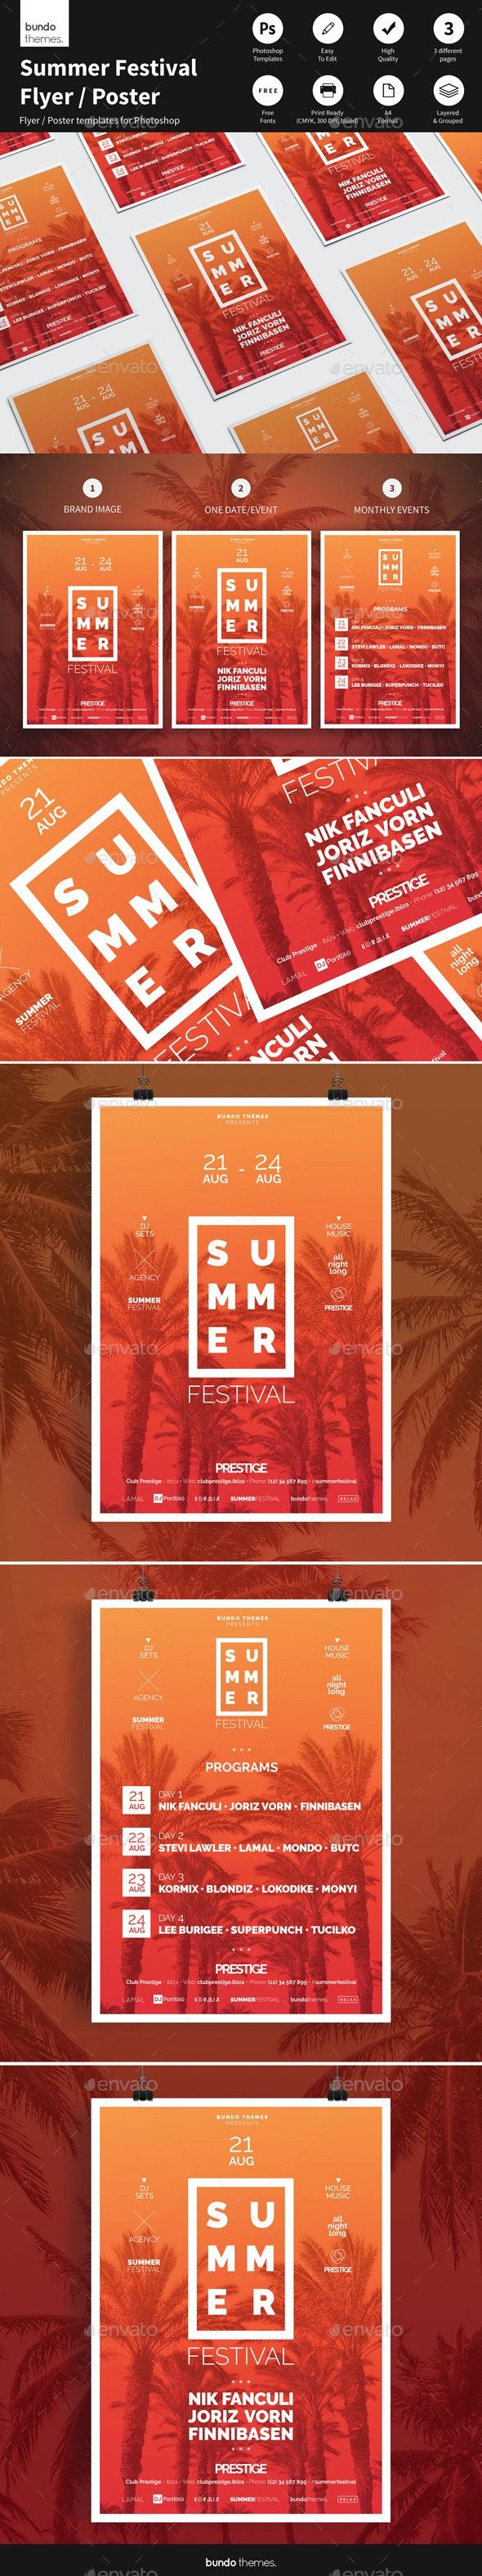 Summer Festival Flyer / Poster - Concerts Events